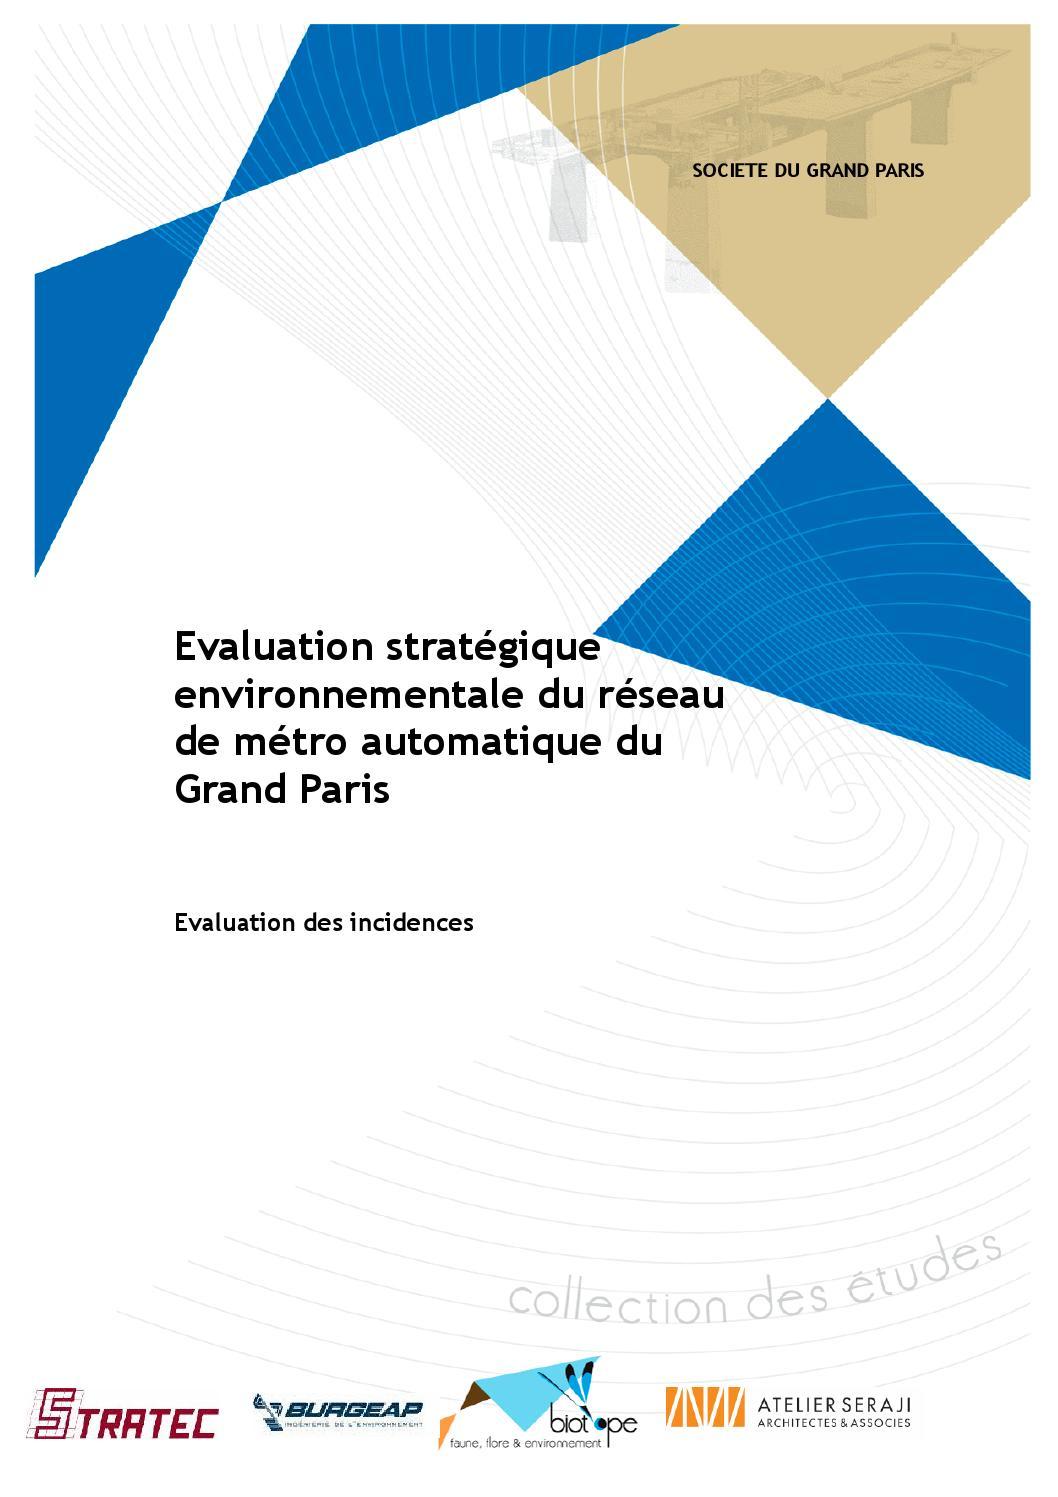 Turin carénage carbone datation résultats